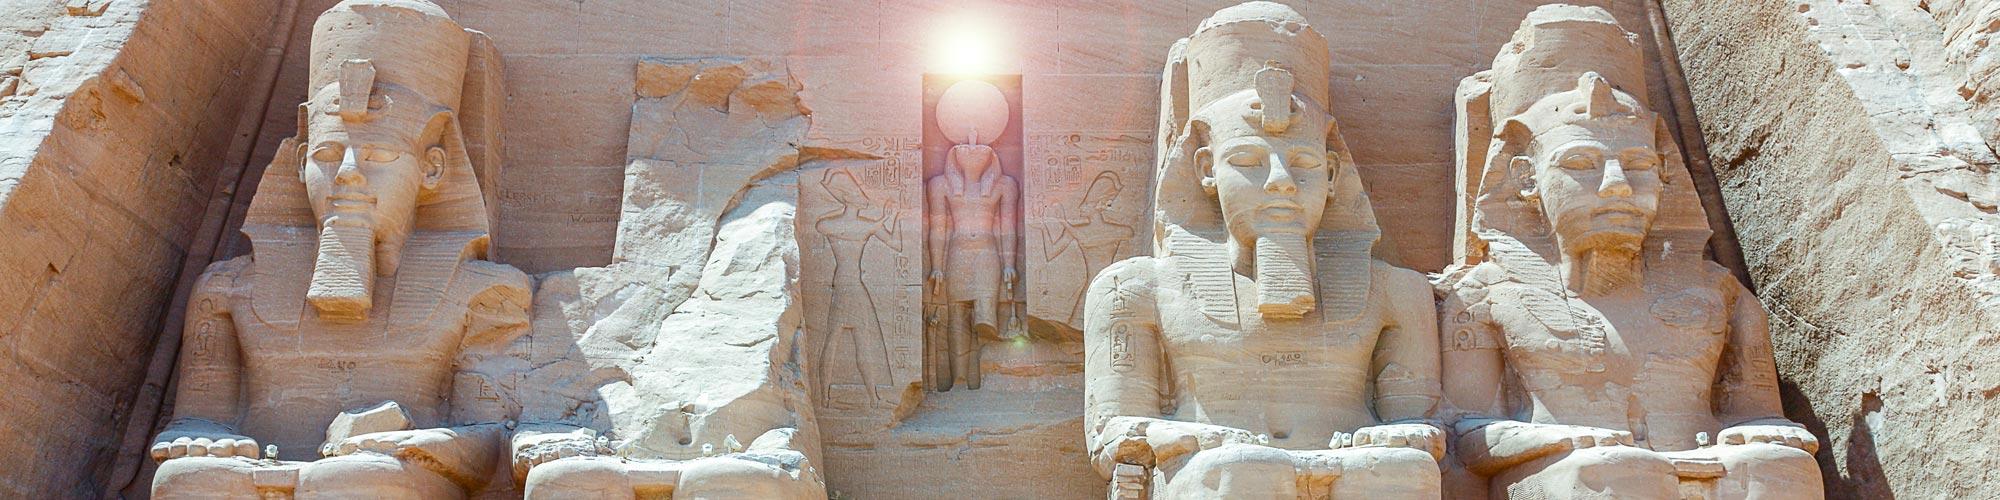 Abu Simbel - El Gouna Excursions - Tours from Hurghada